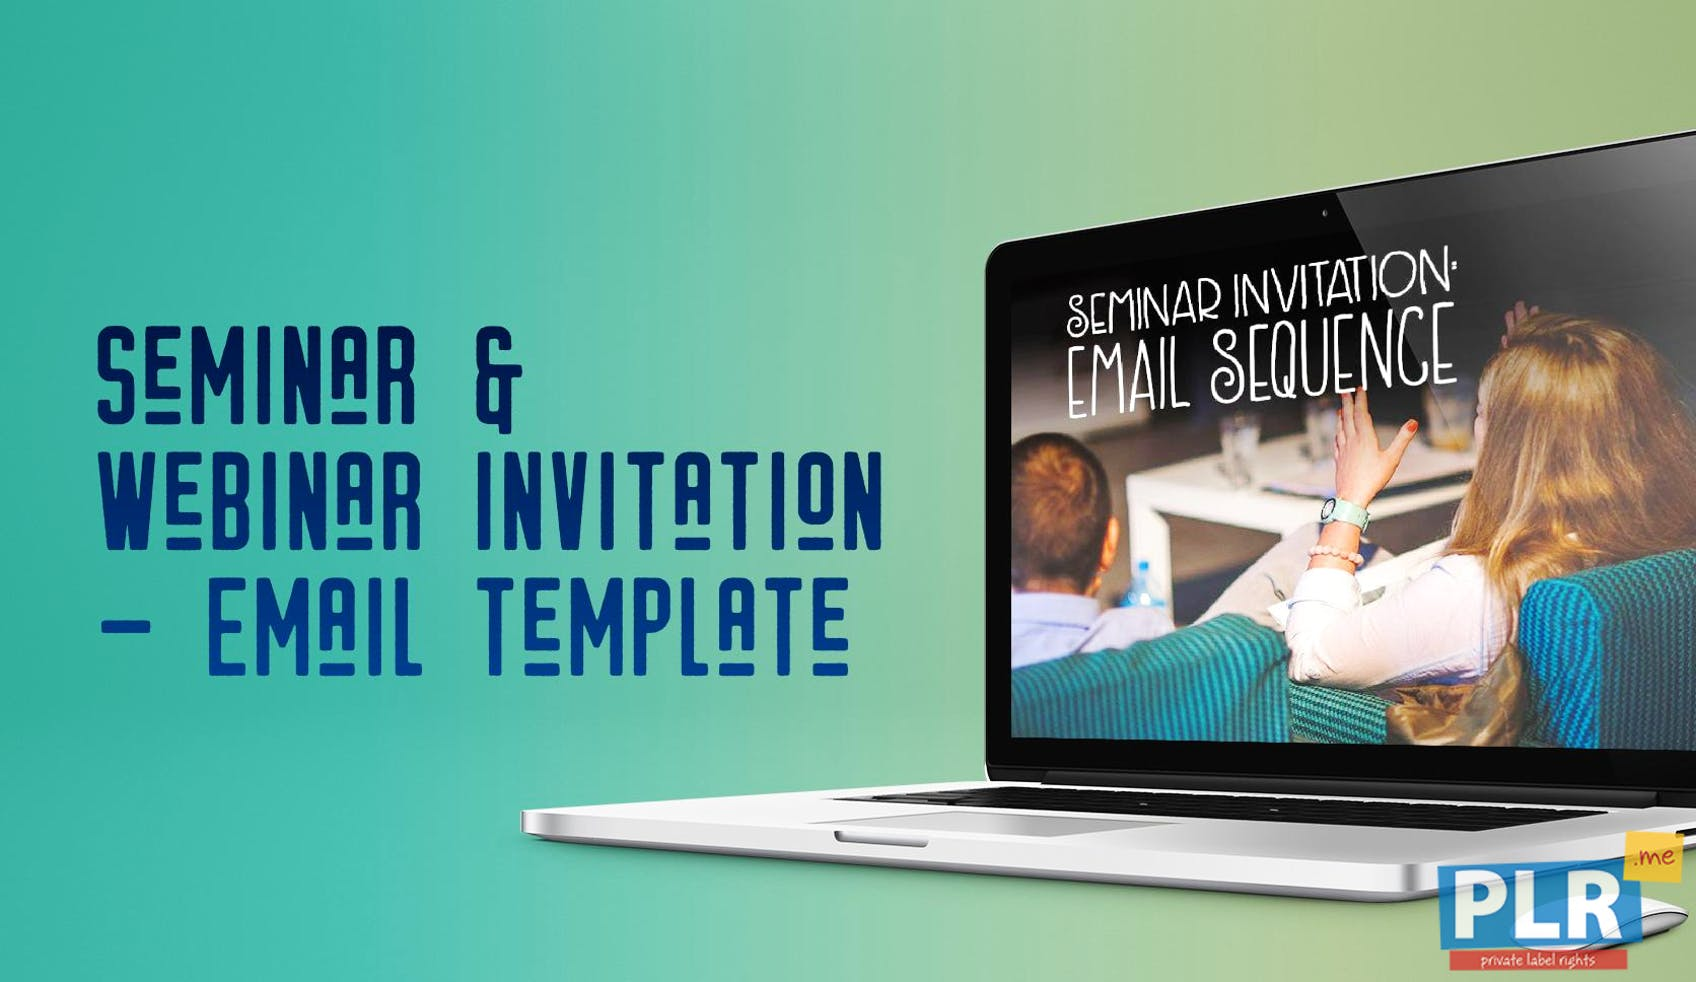 Seminar And Webinar Invitation Email Template